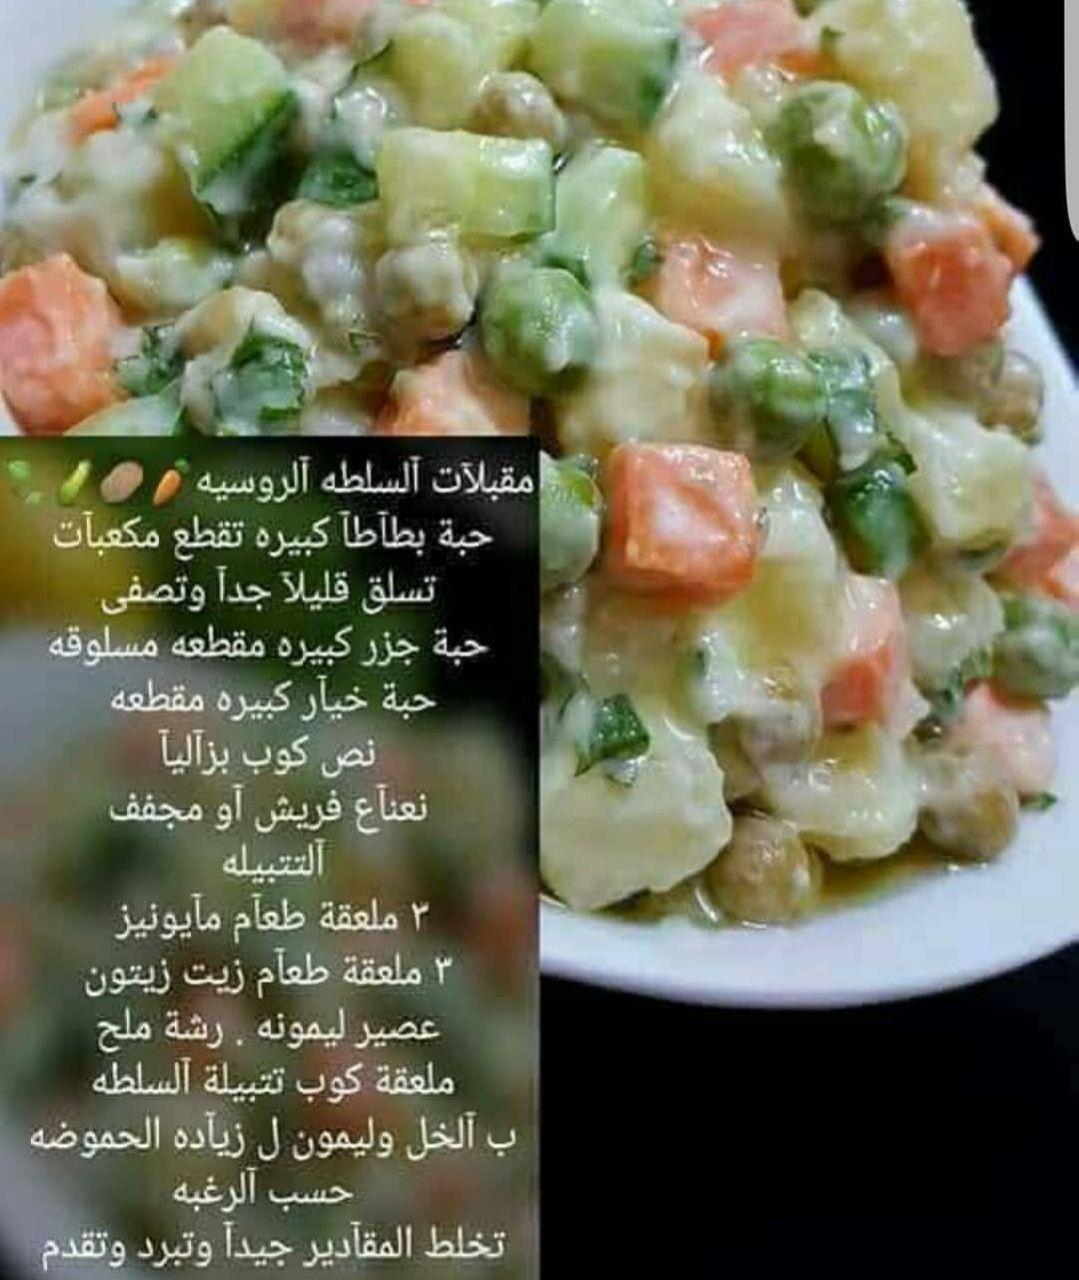 سلطه روسيه Cookout Food Helthy Food Food Receipes